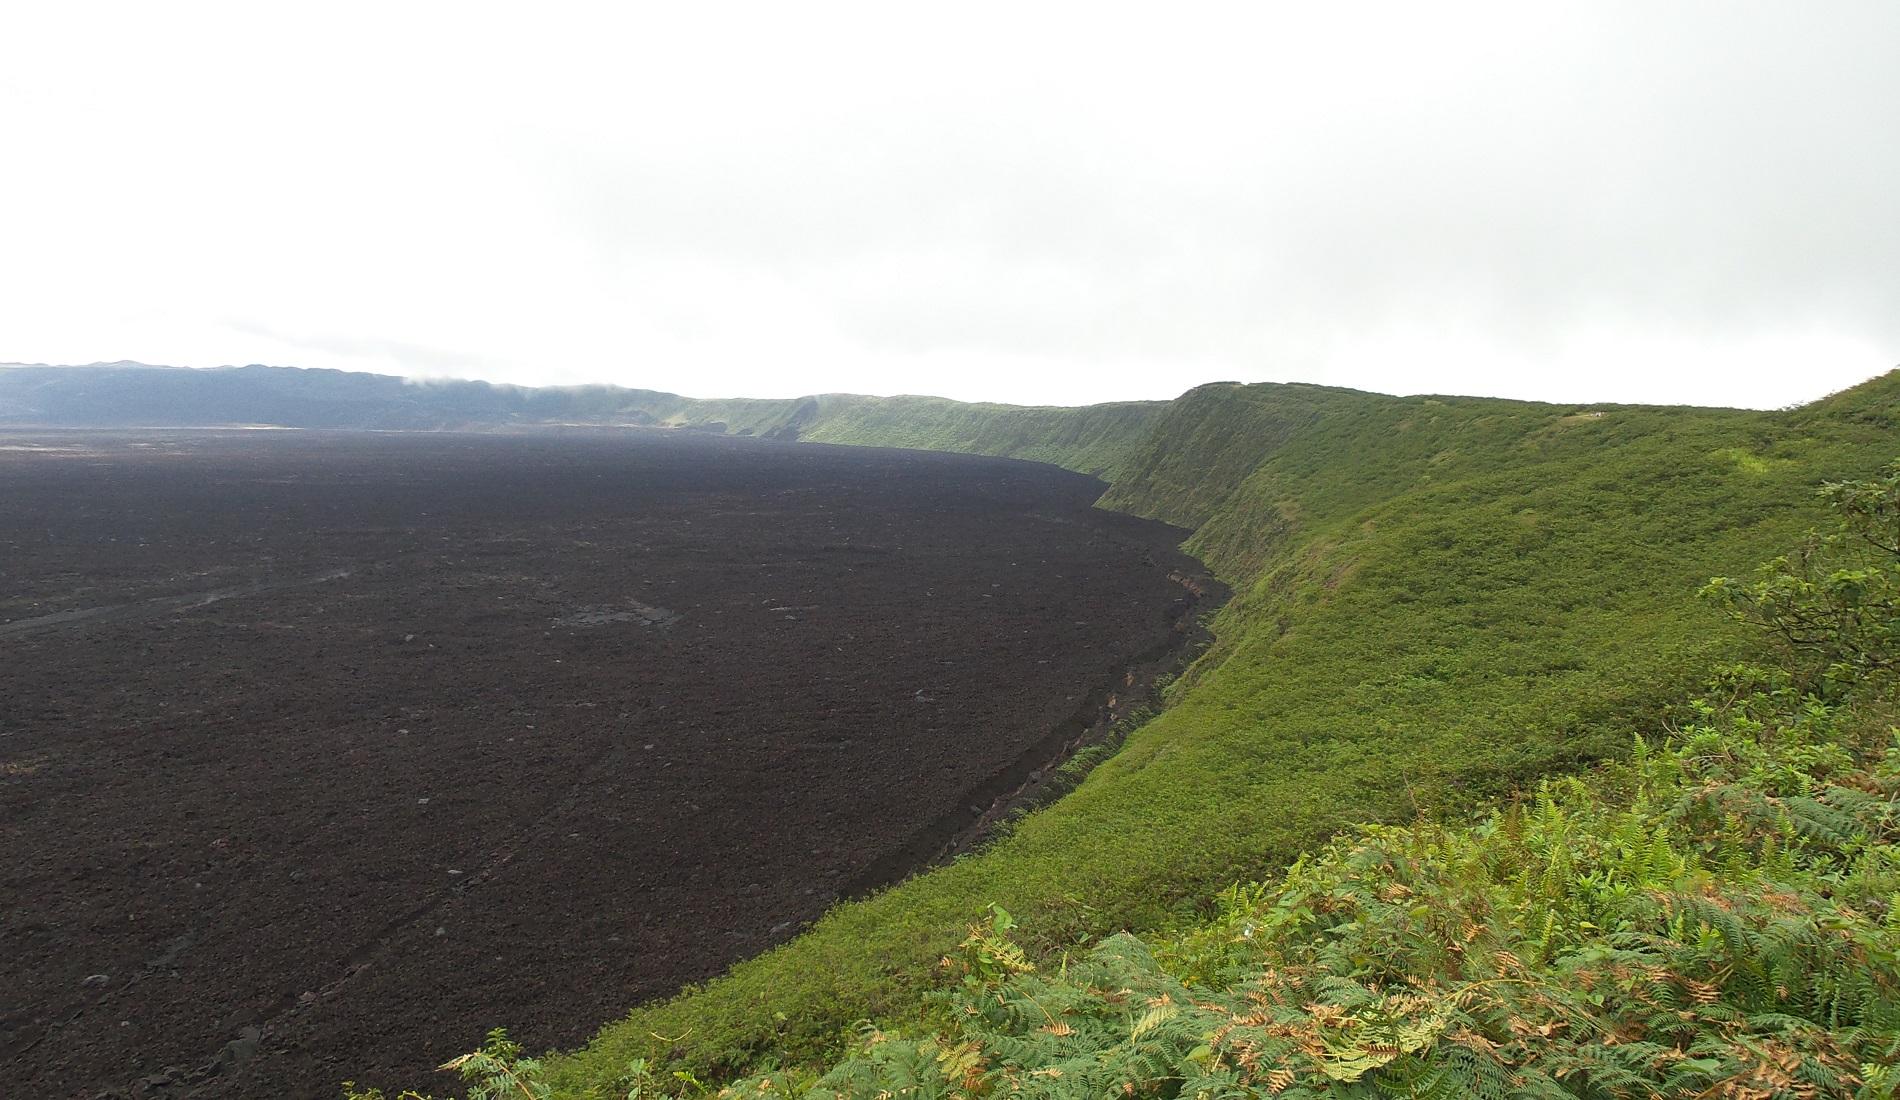 rondreis galapagos eilanden sierra negra